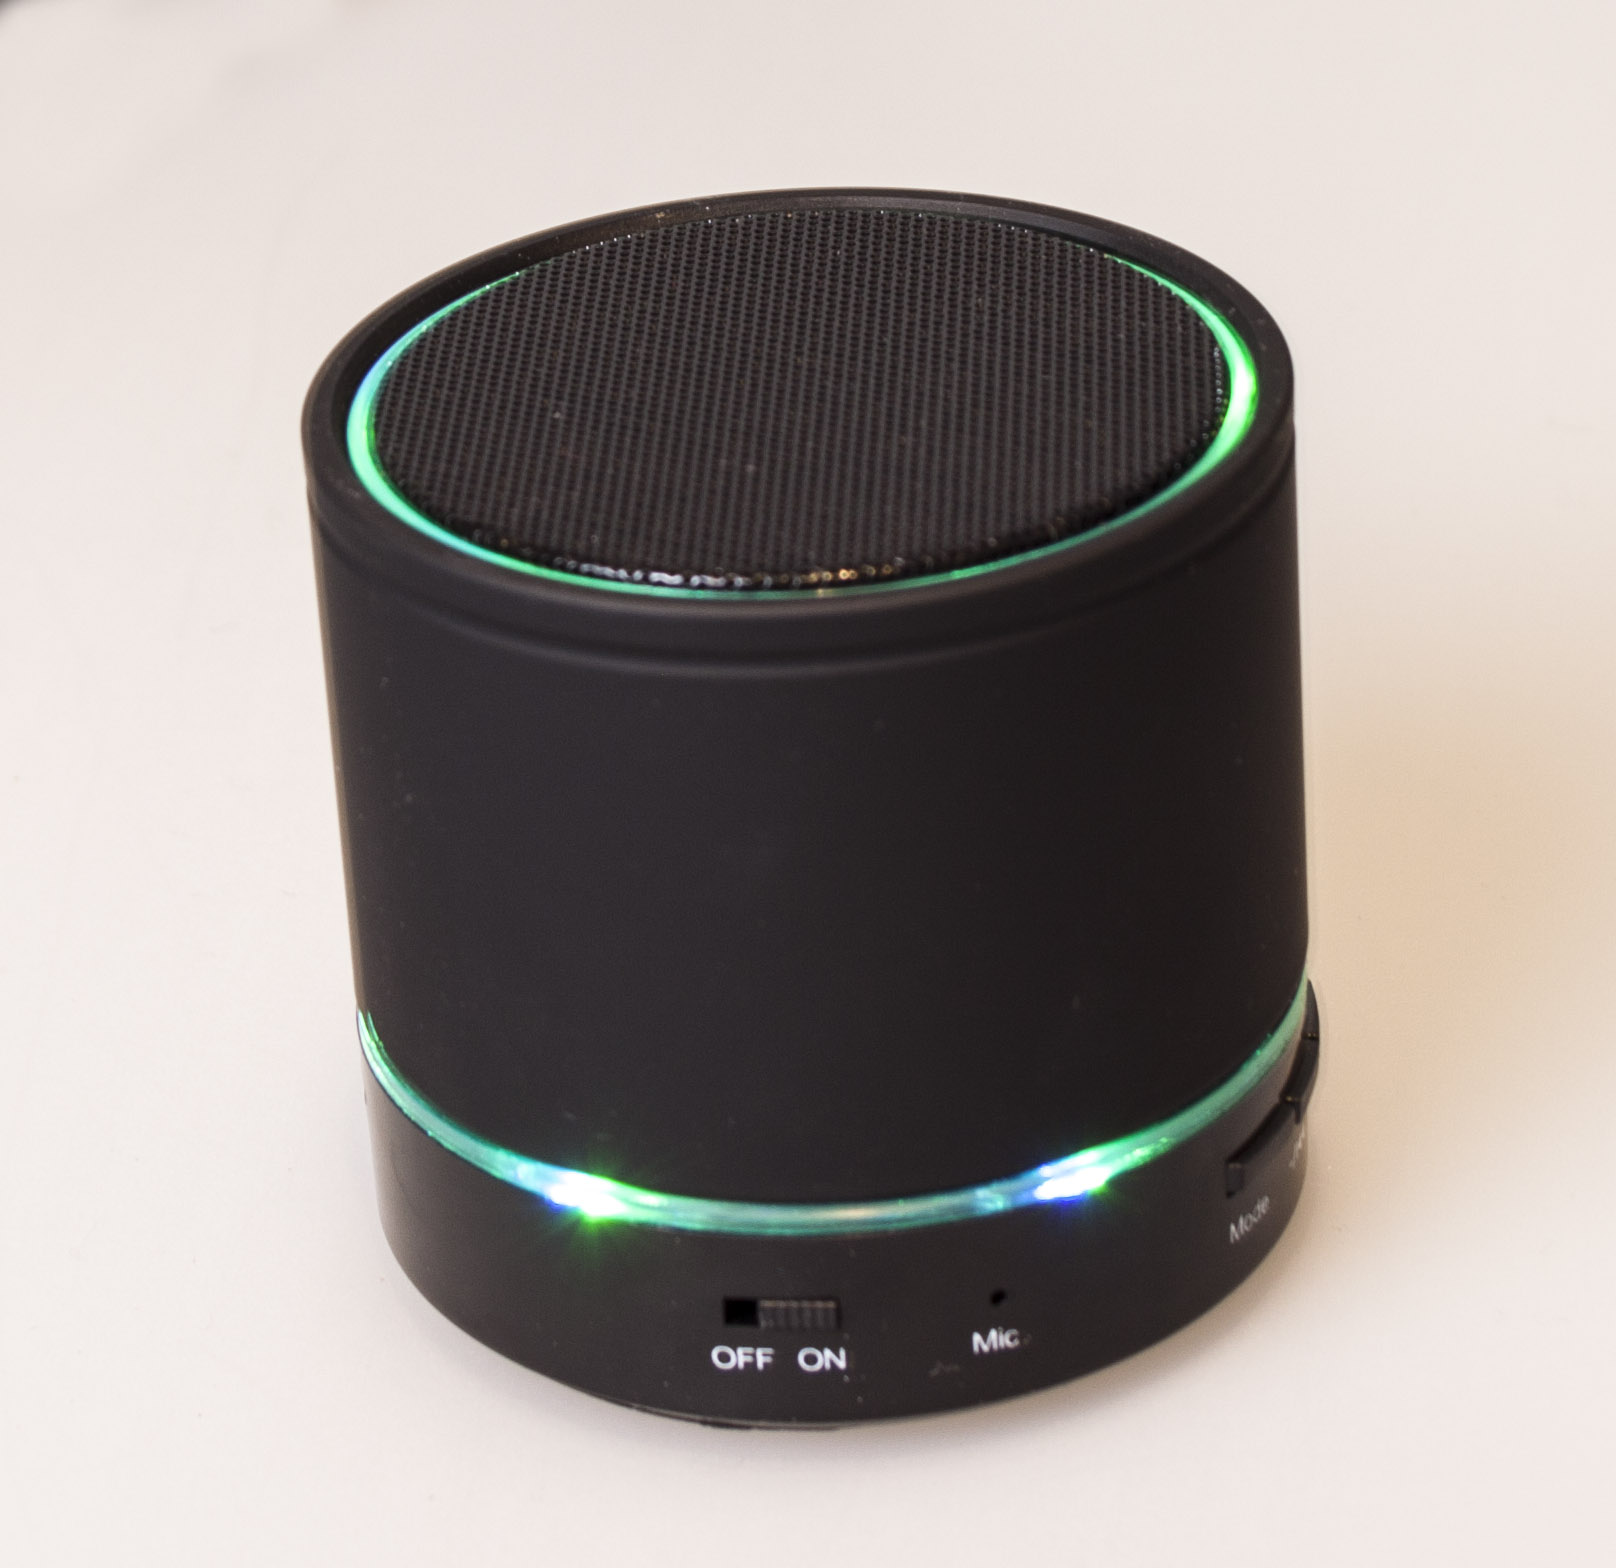 SERO Bluetooth Højtaler med LED Lys Sort